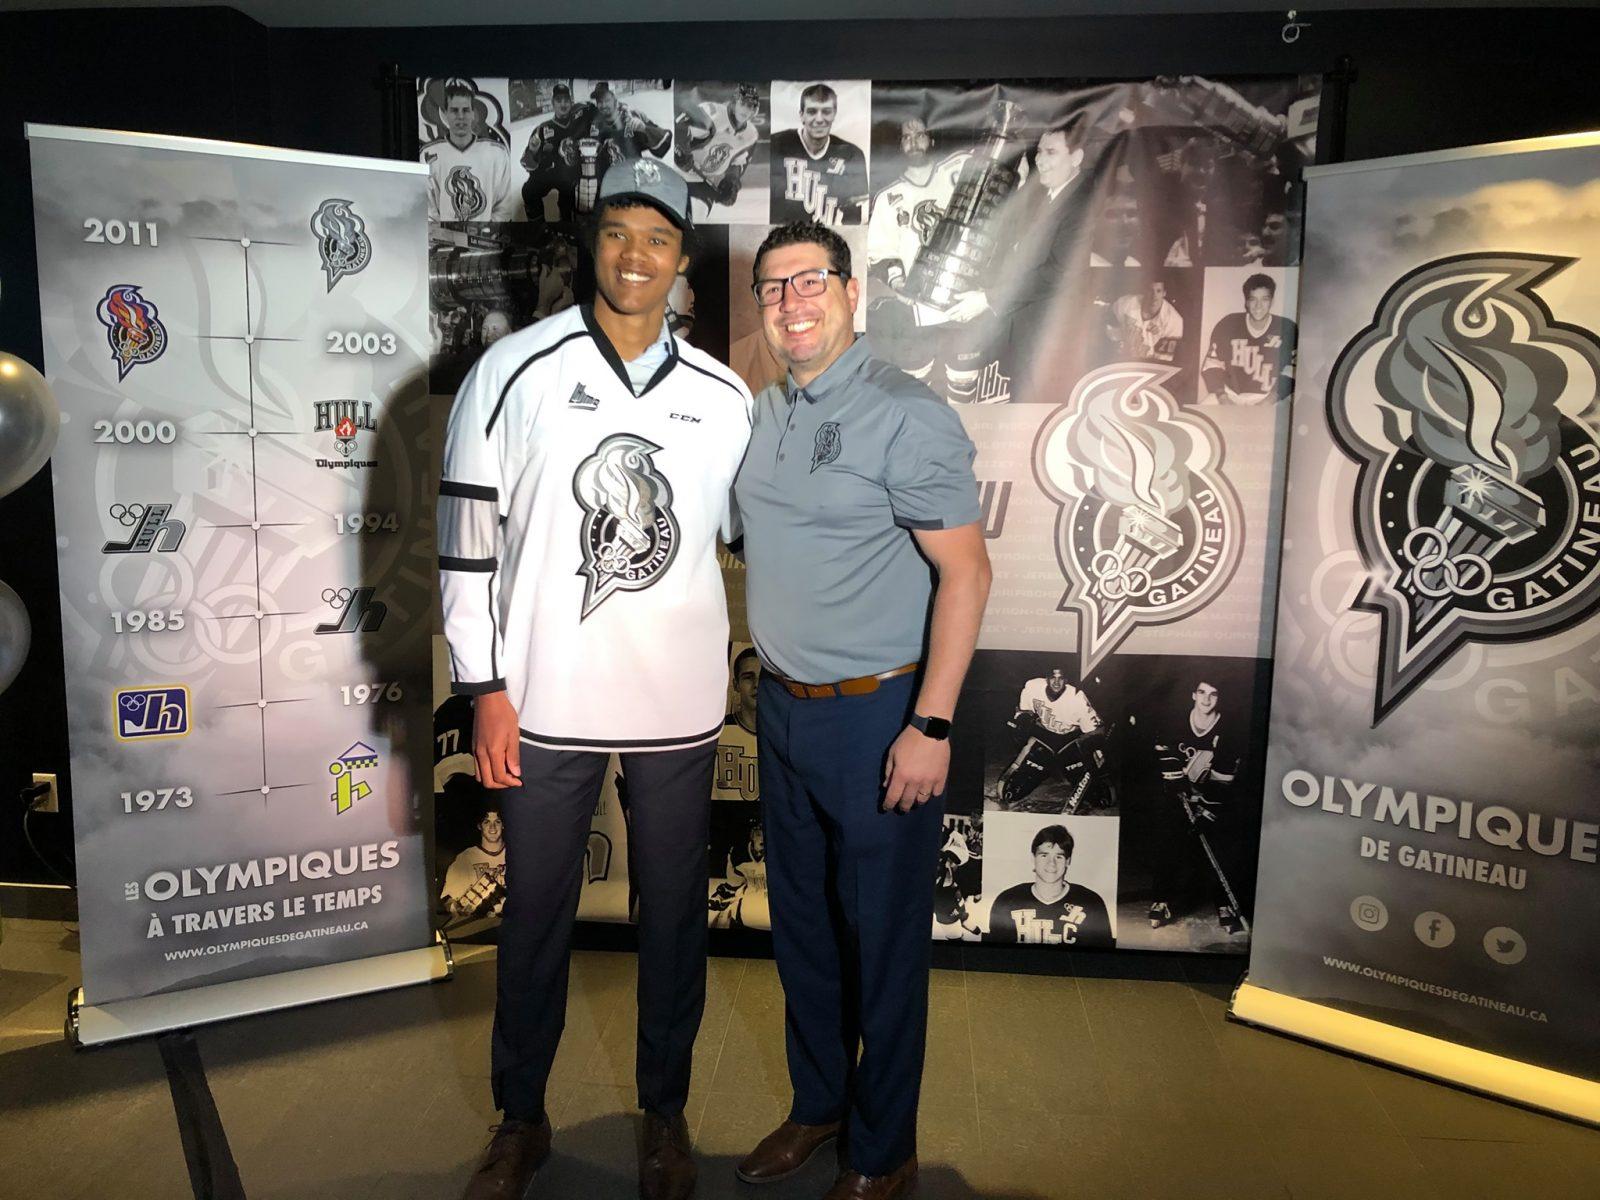 Noah Warren avec les Olympiques de Gatineau